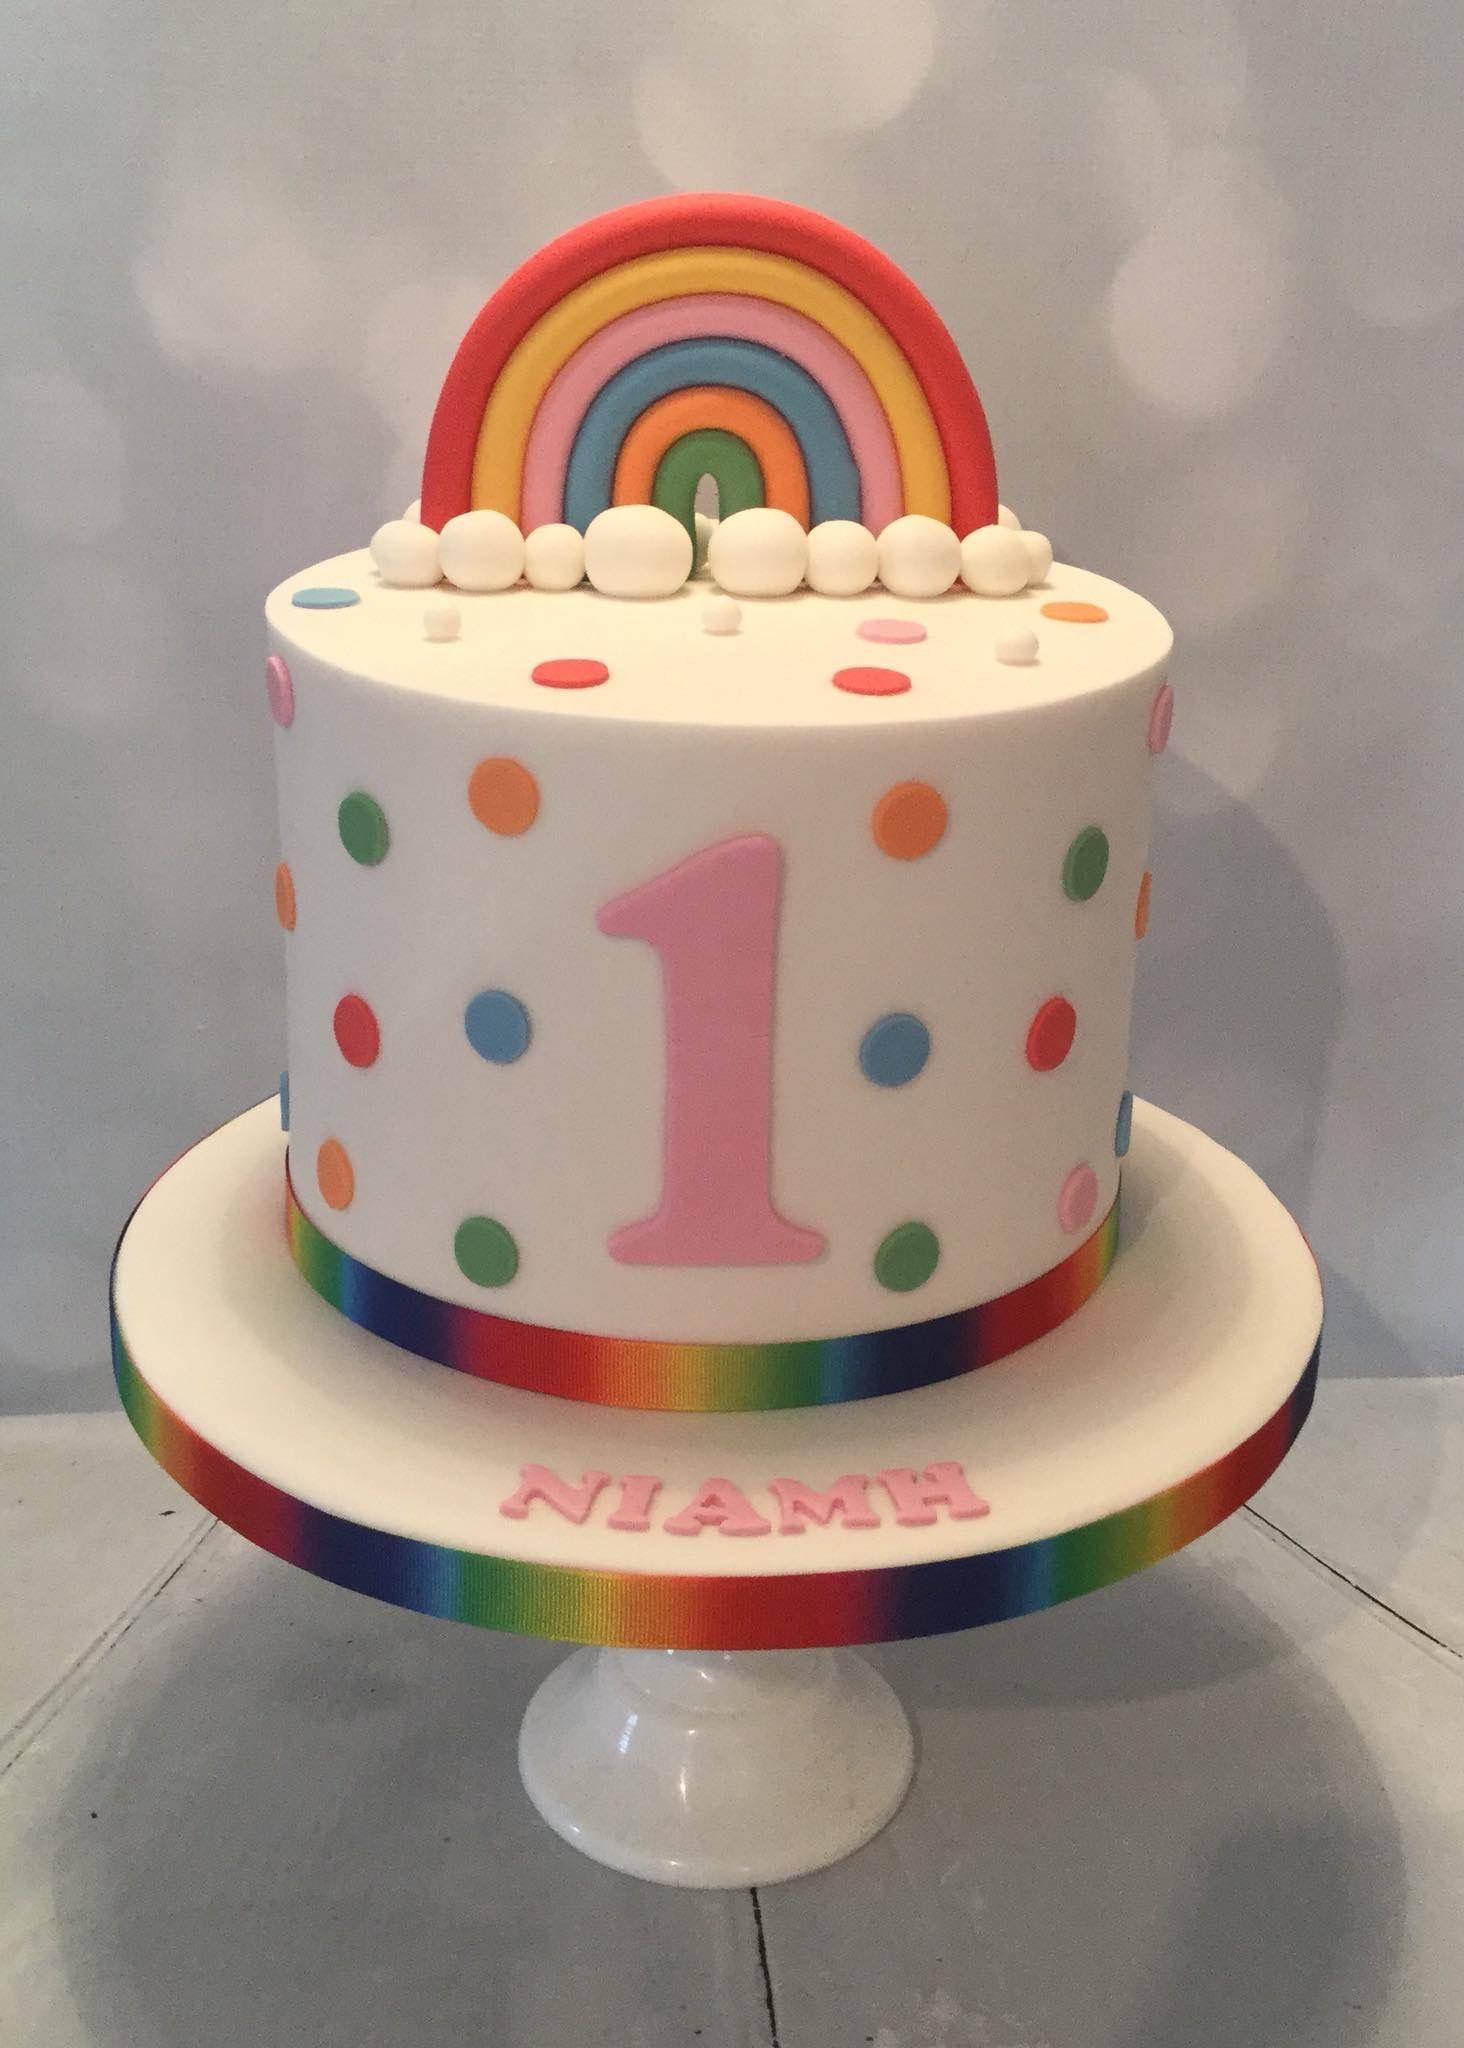 Girls first birthday cake 1st birthday cake for girls